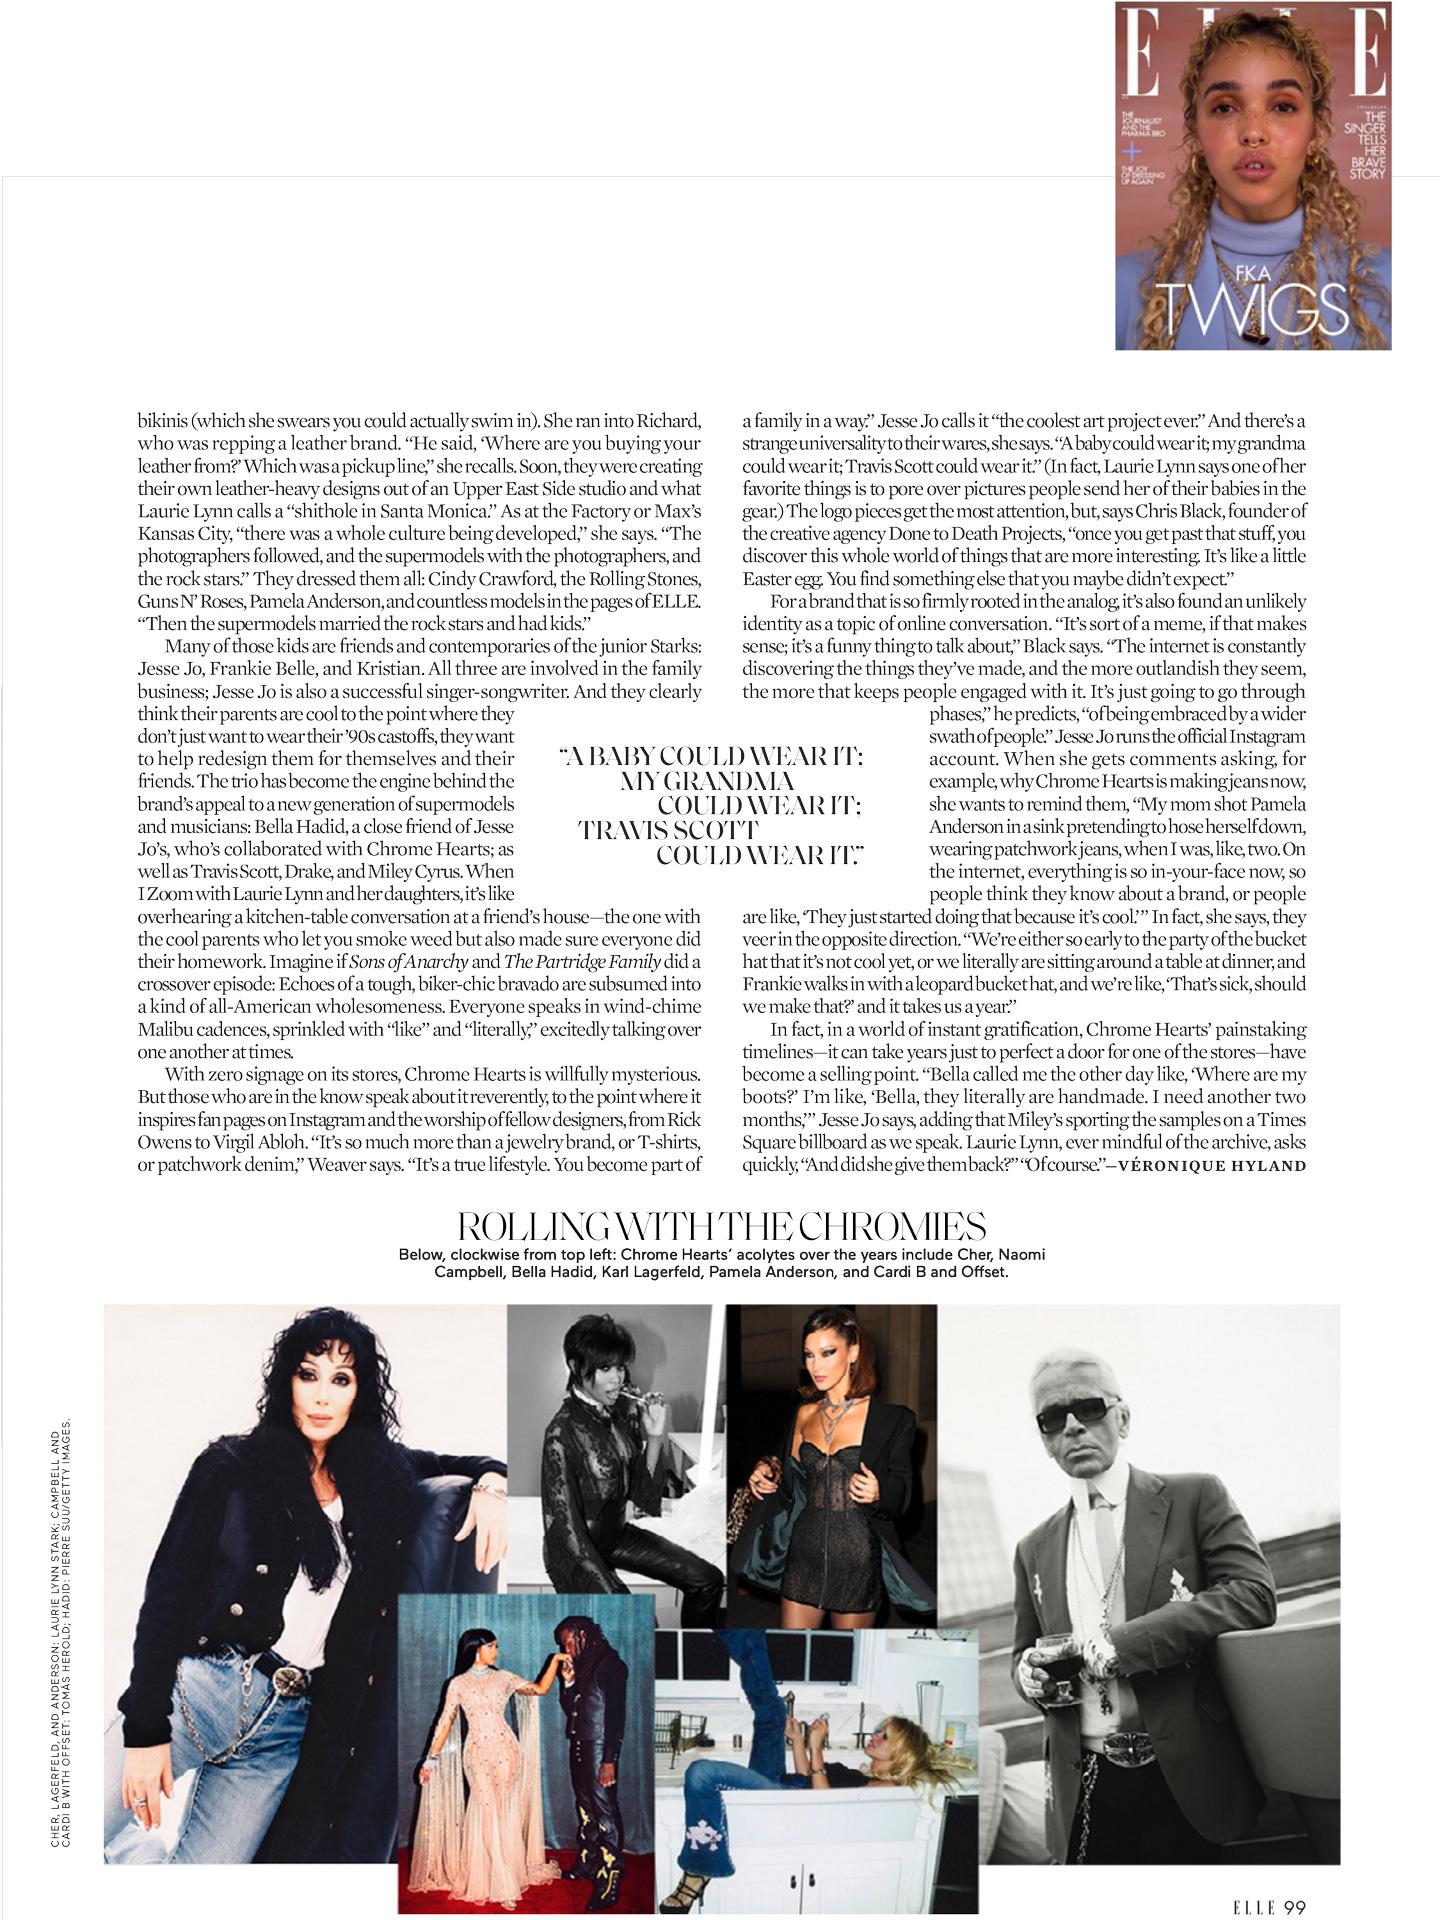 chrome hearts x Elle Magazine 2021 laurie lynn stark press